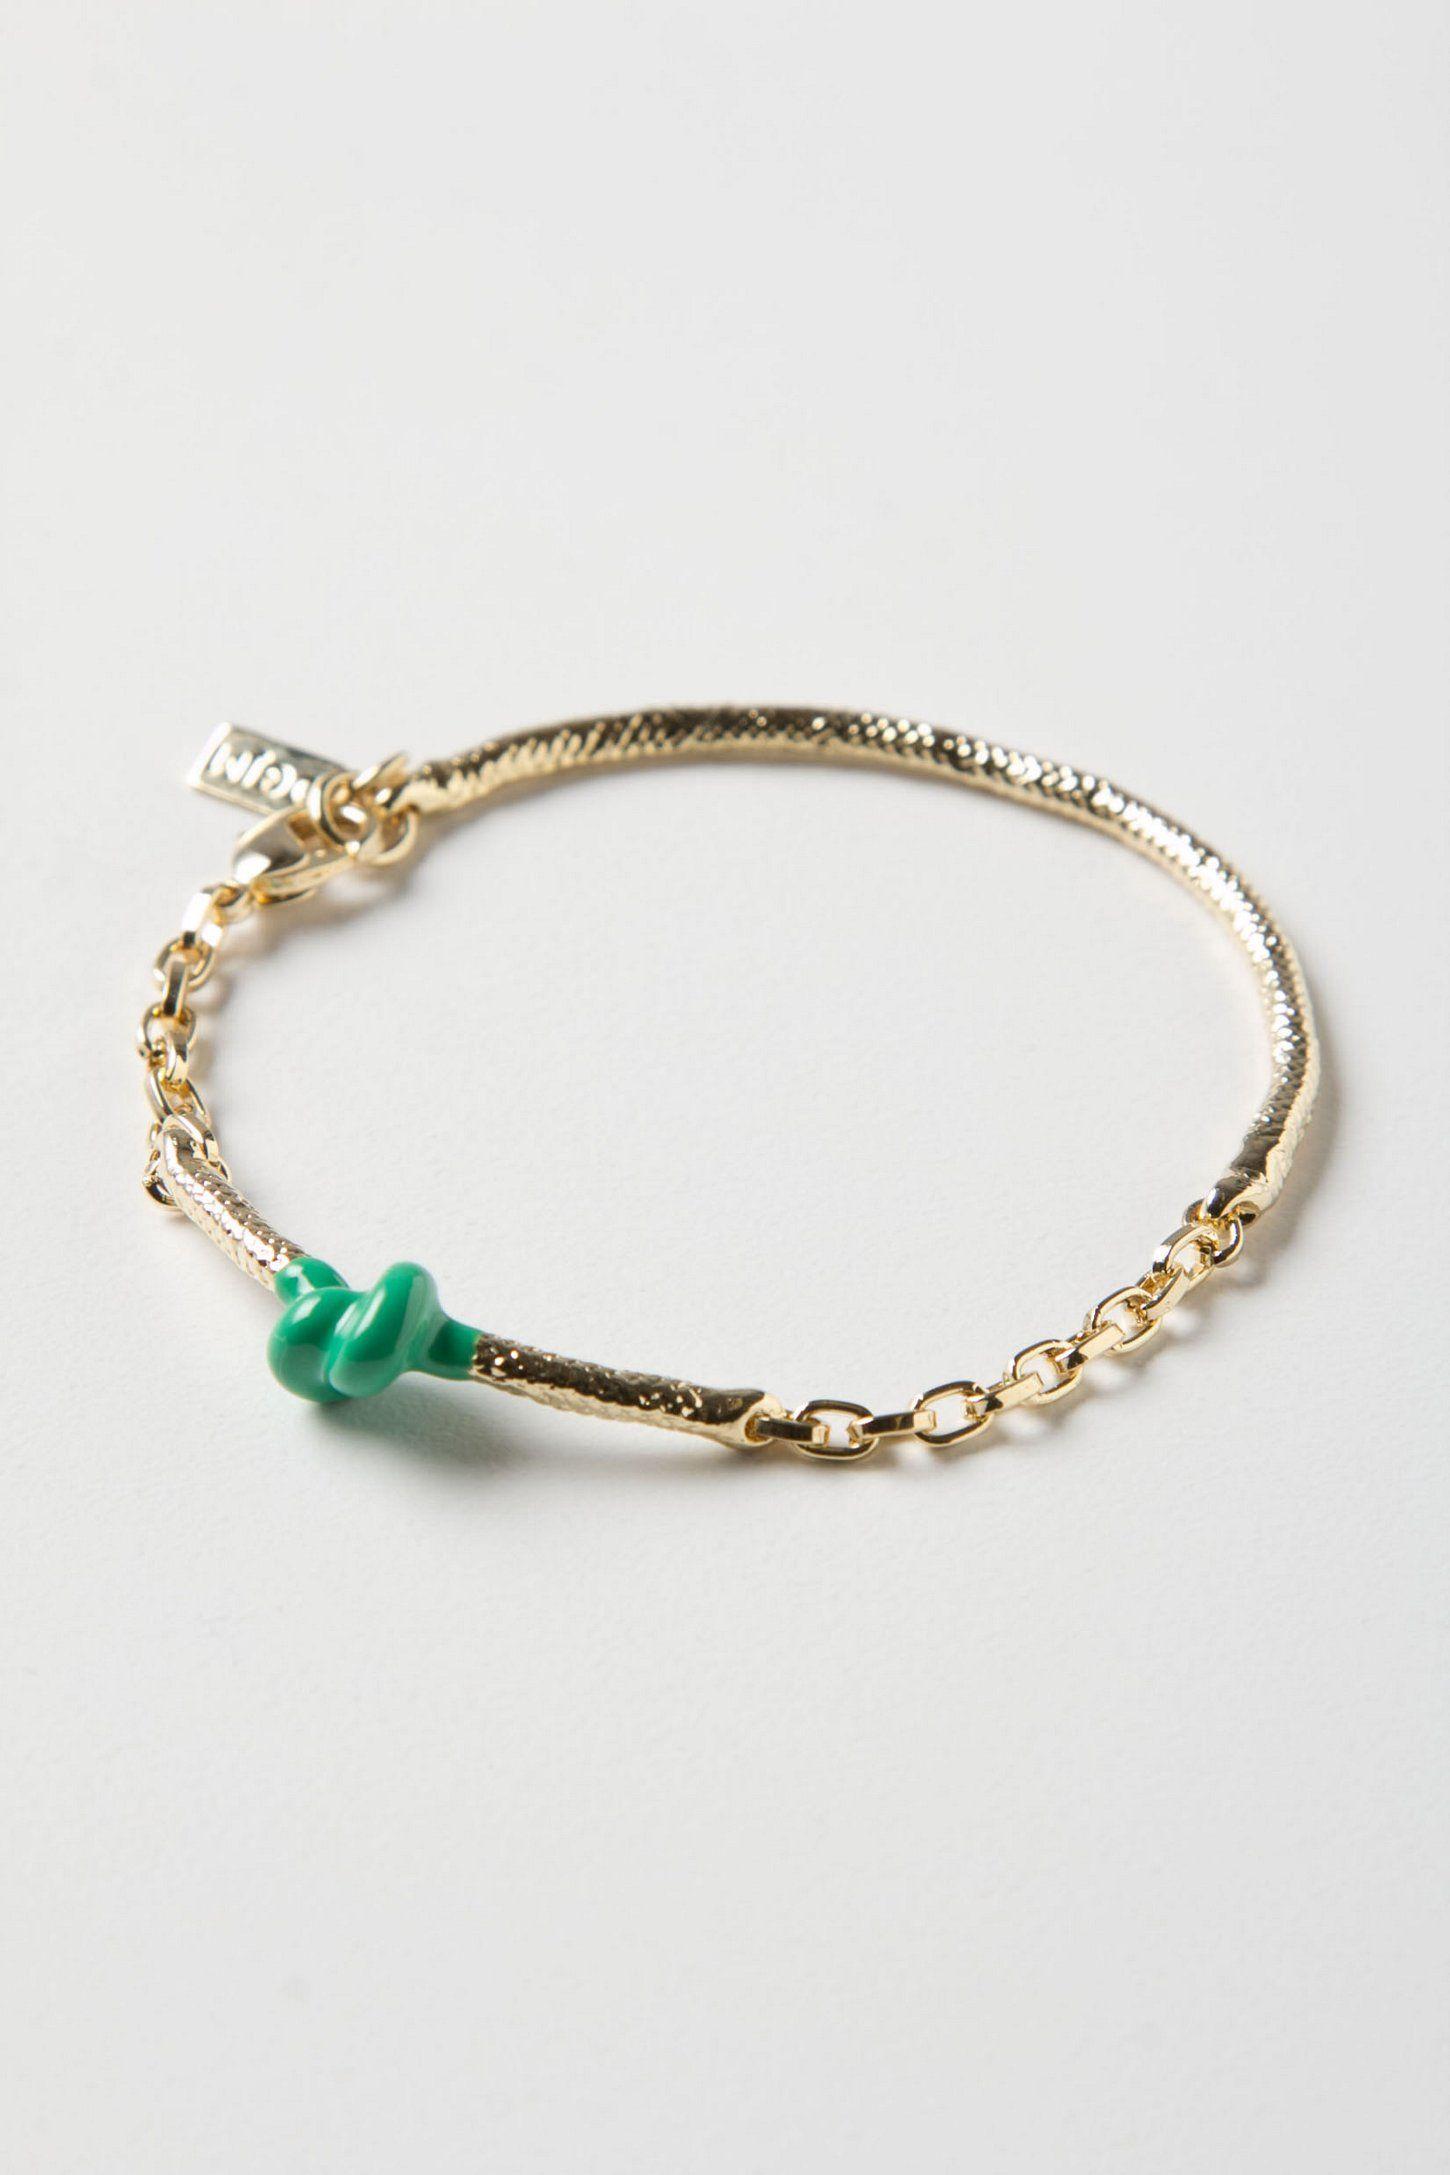 Bubblegum knot necklace anthropologie my style pinterest